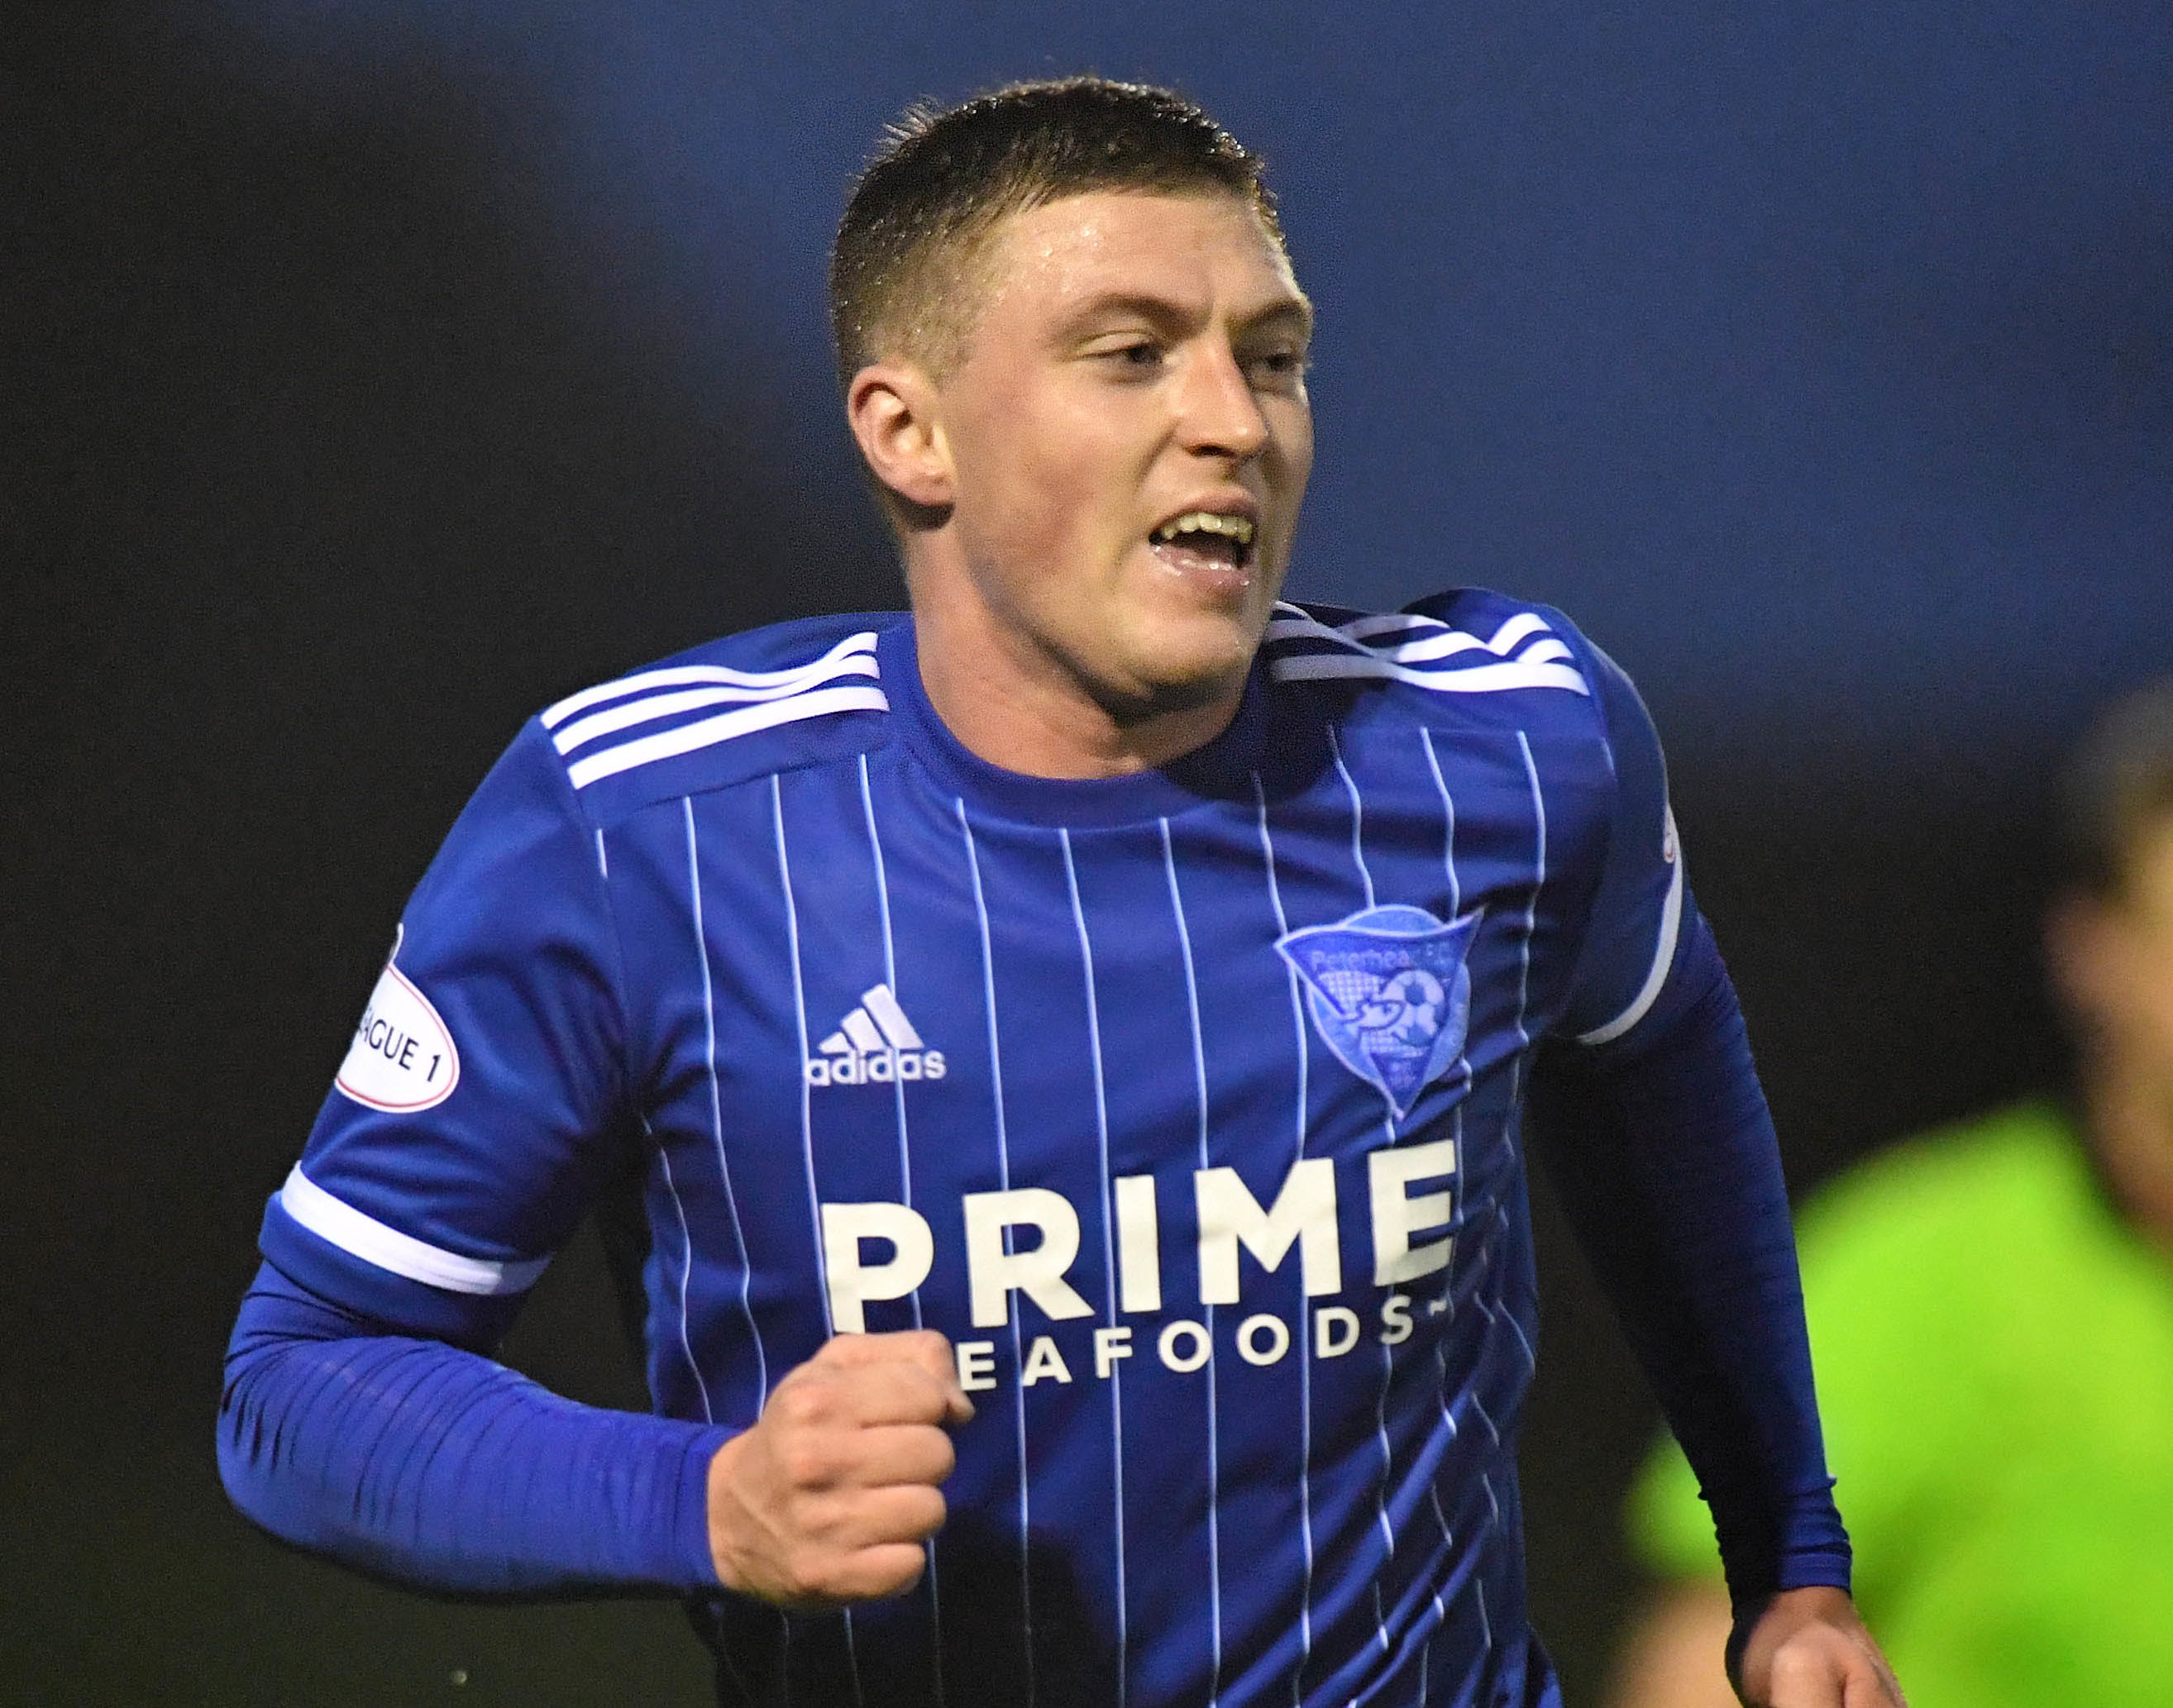 Peterhead midfielder Gary Fraser